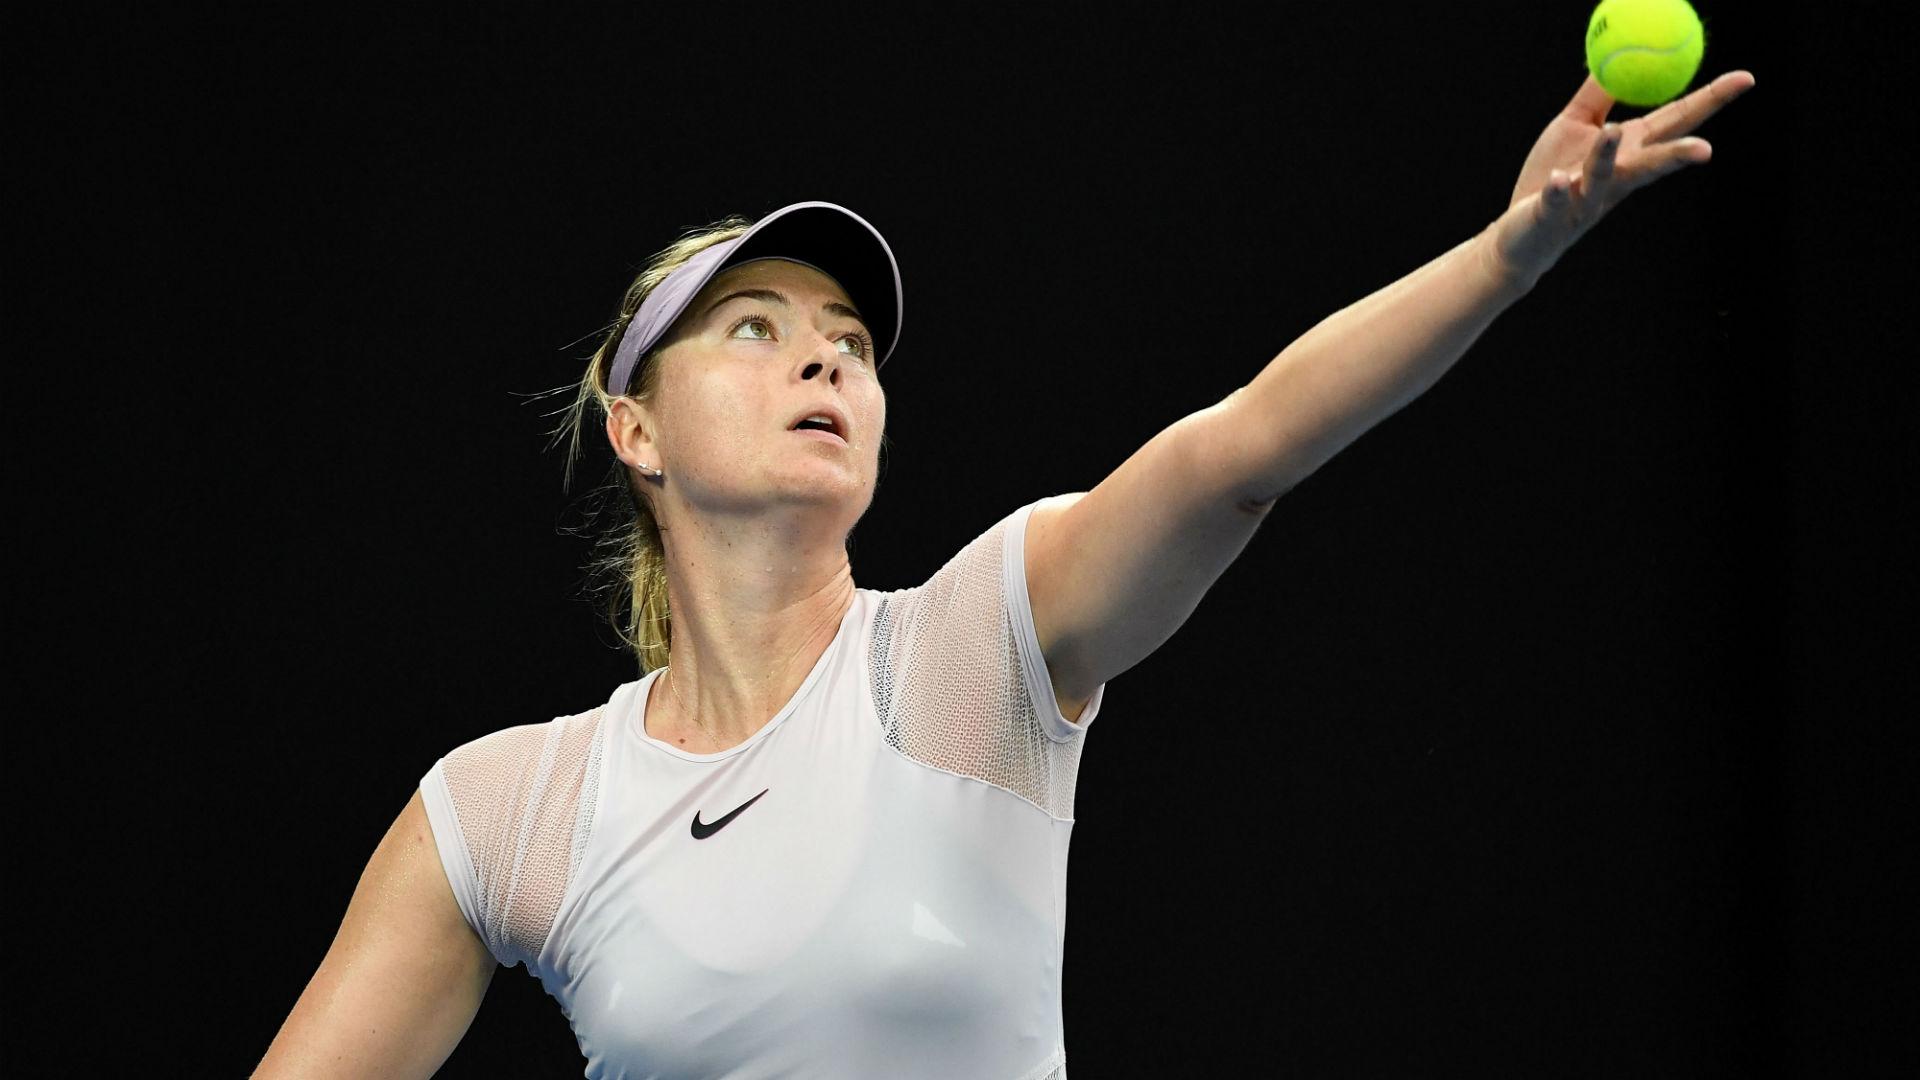 Australian Open Day 6 Highlights: Simona Halep survives marathon against Lauren Davis